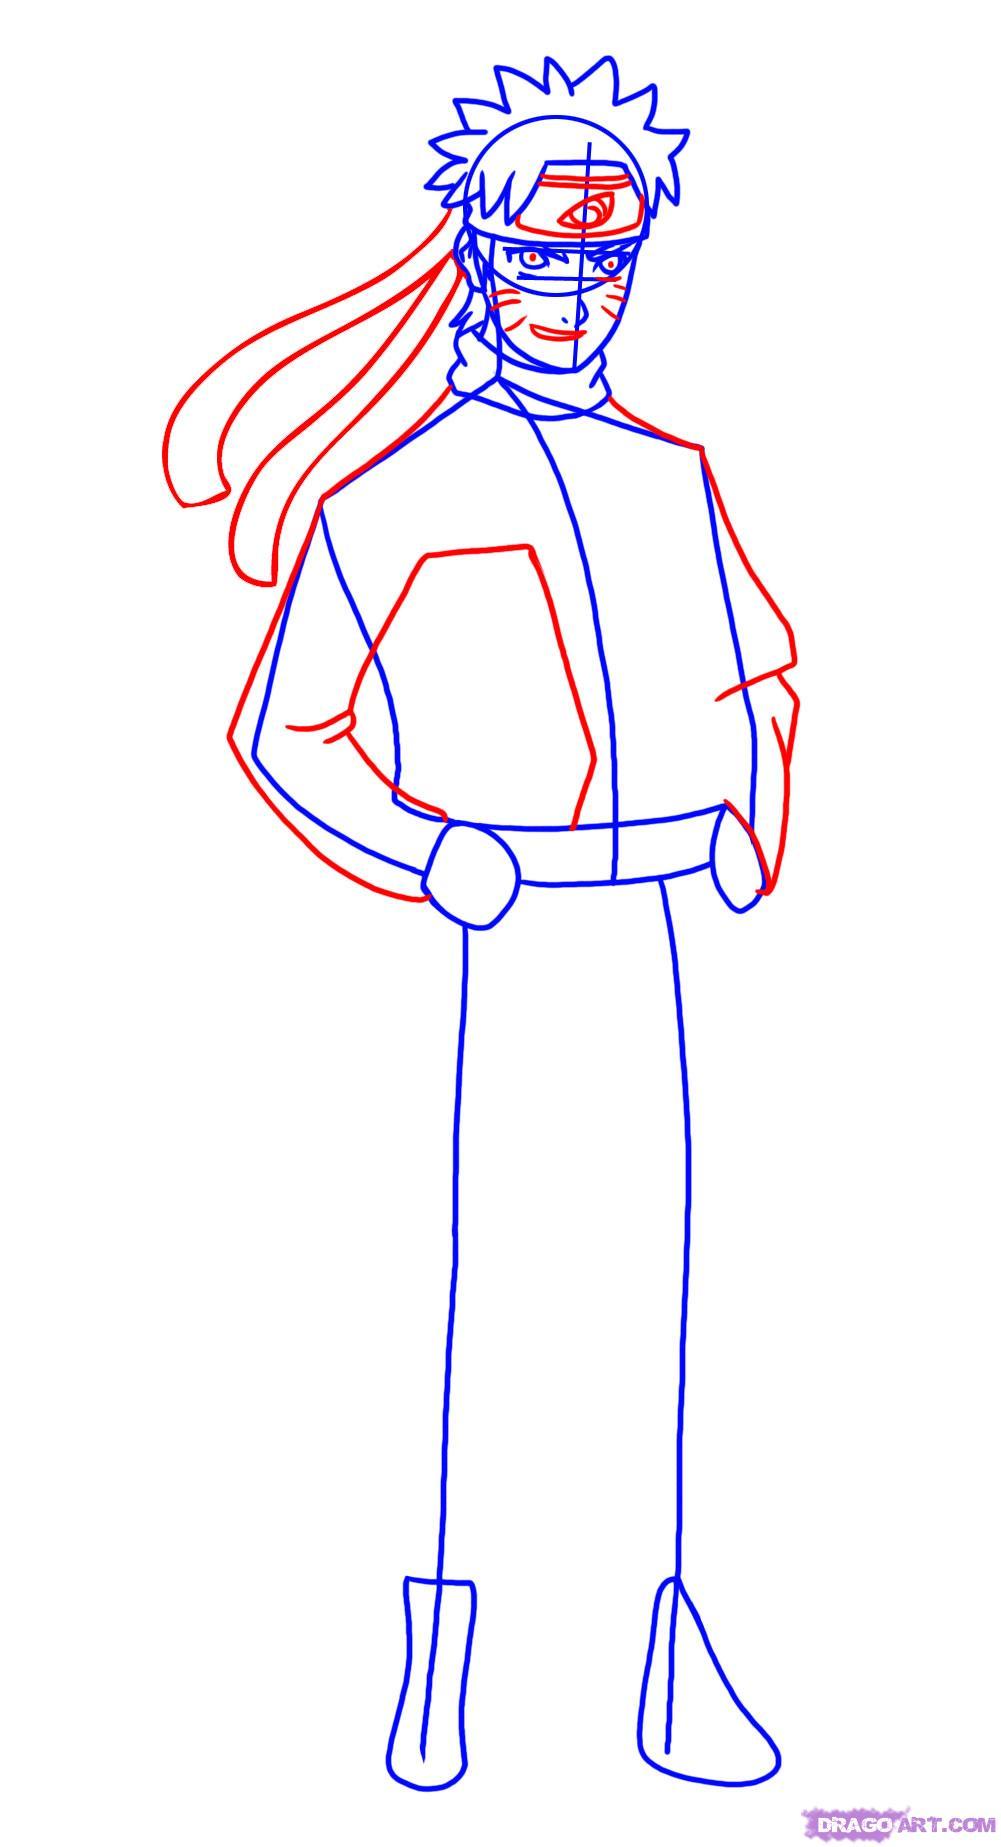 Drawn naruto dragoart Shippuden How Naruto 4 how